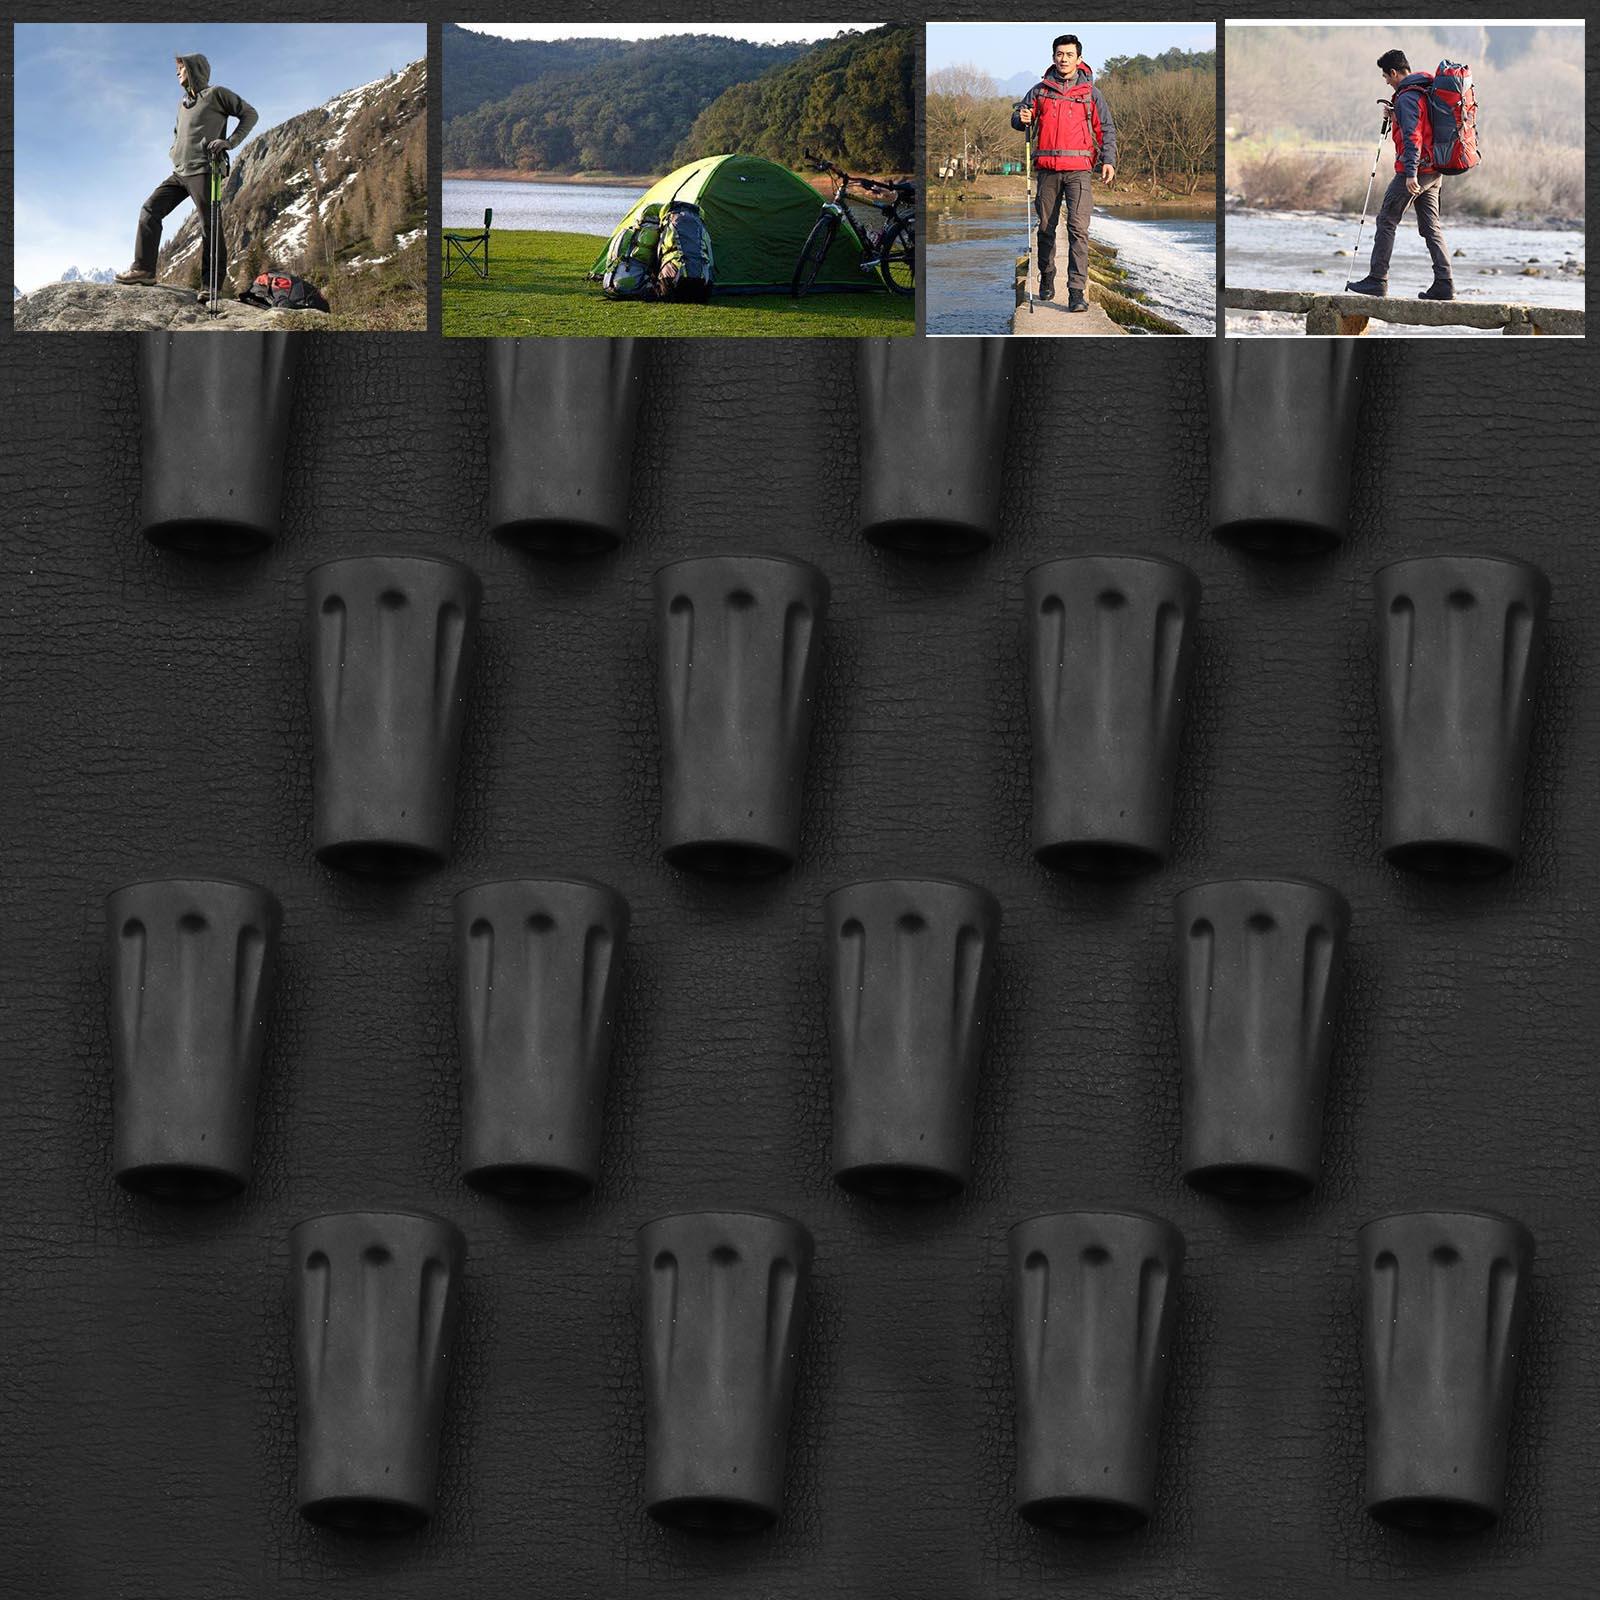 Collapsible Hiking Walking Sticks Alpenstocks Anti Shock Tips 16Pcs Black Rubber